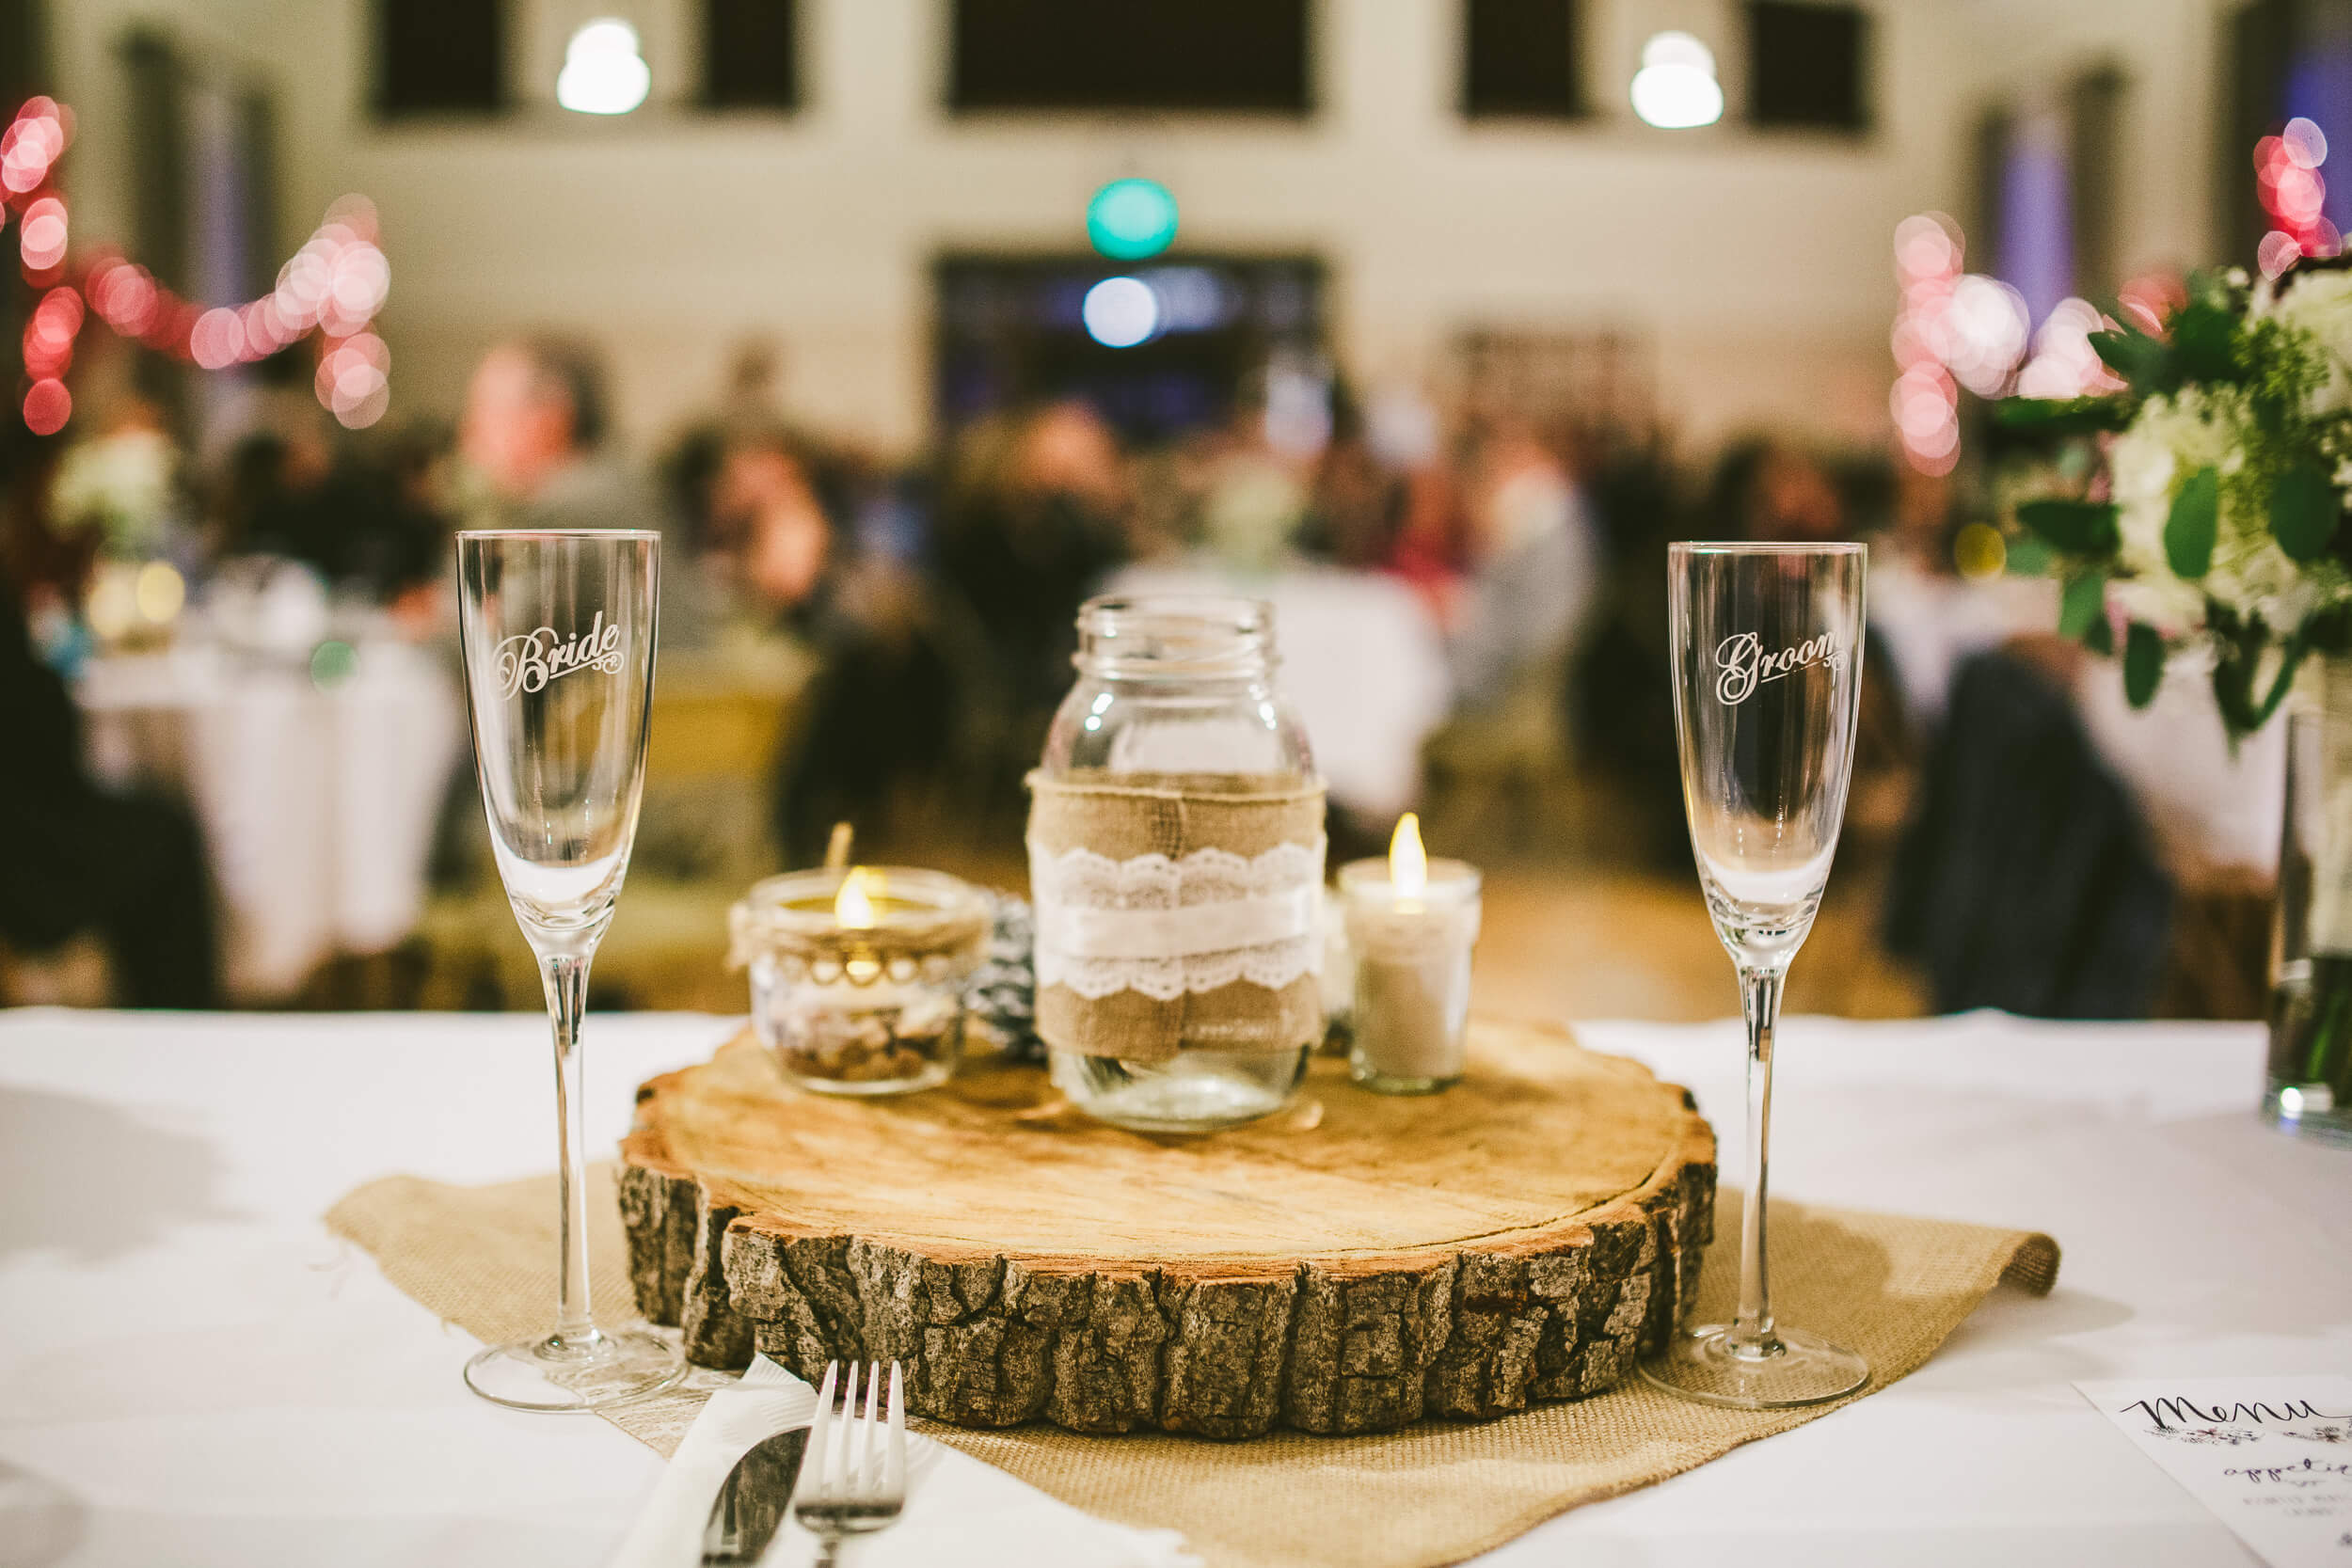 mukogawa winter wedding in spokane (209).jpg